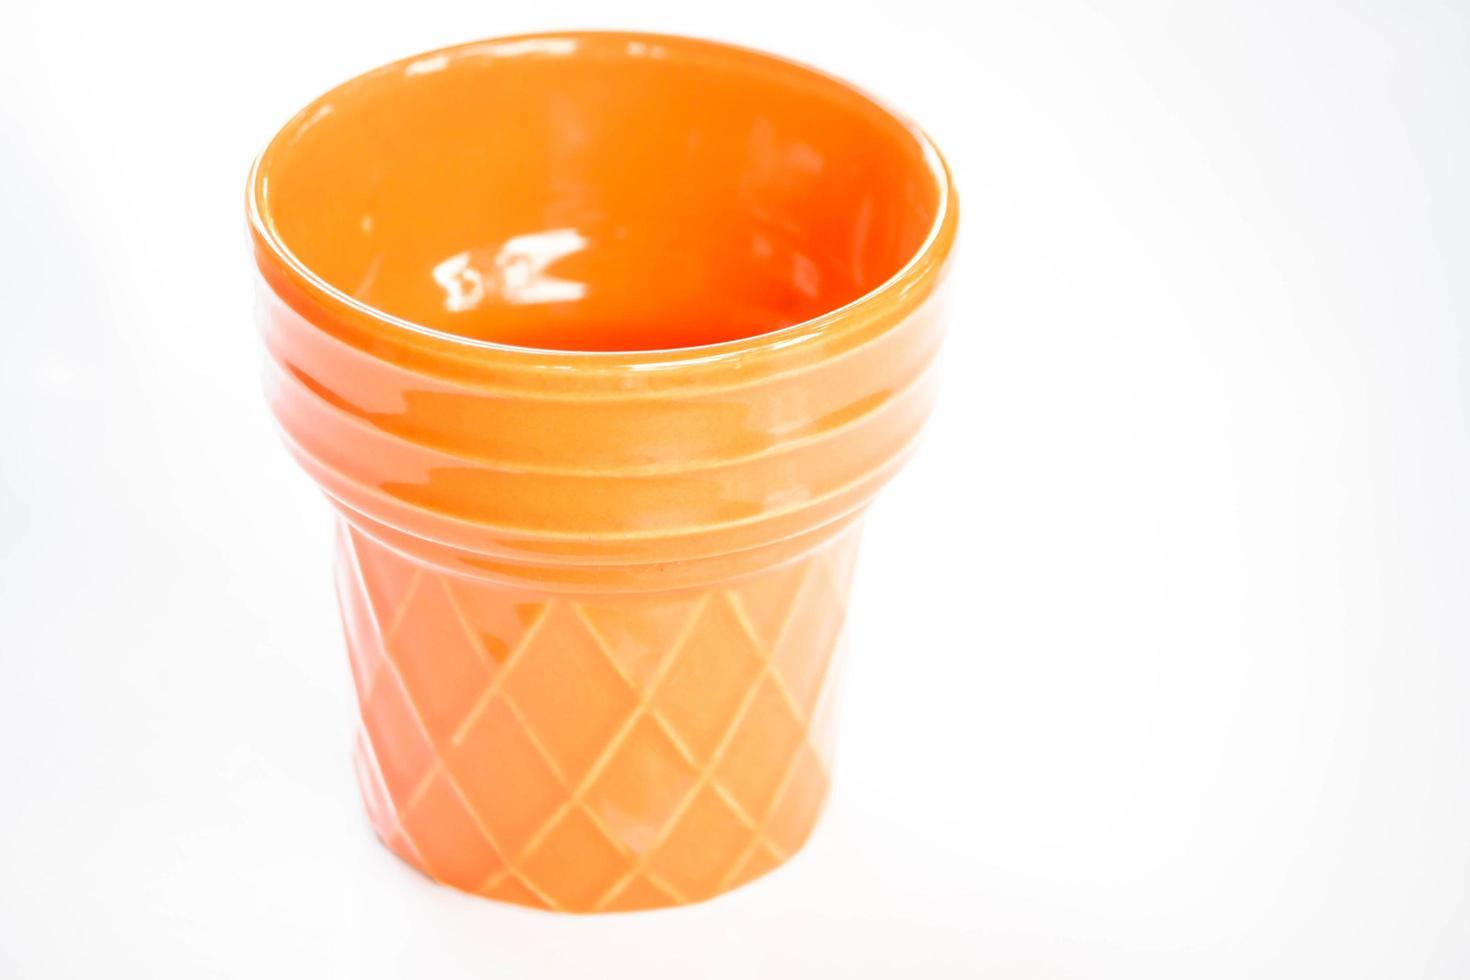 tasse orange sur fond blanc photo